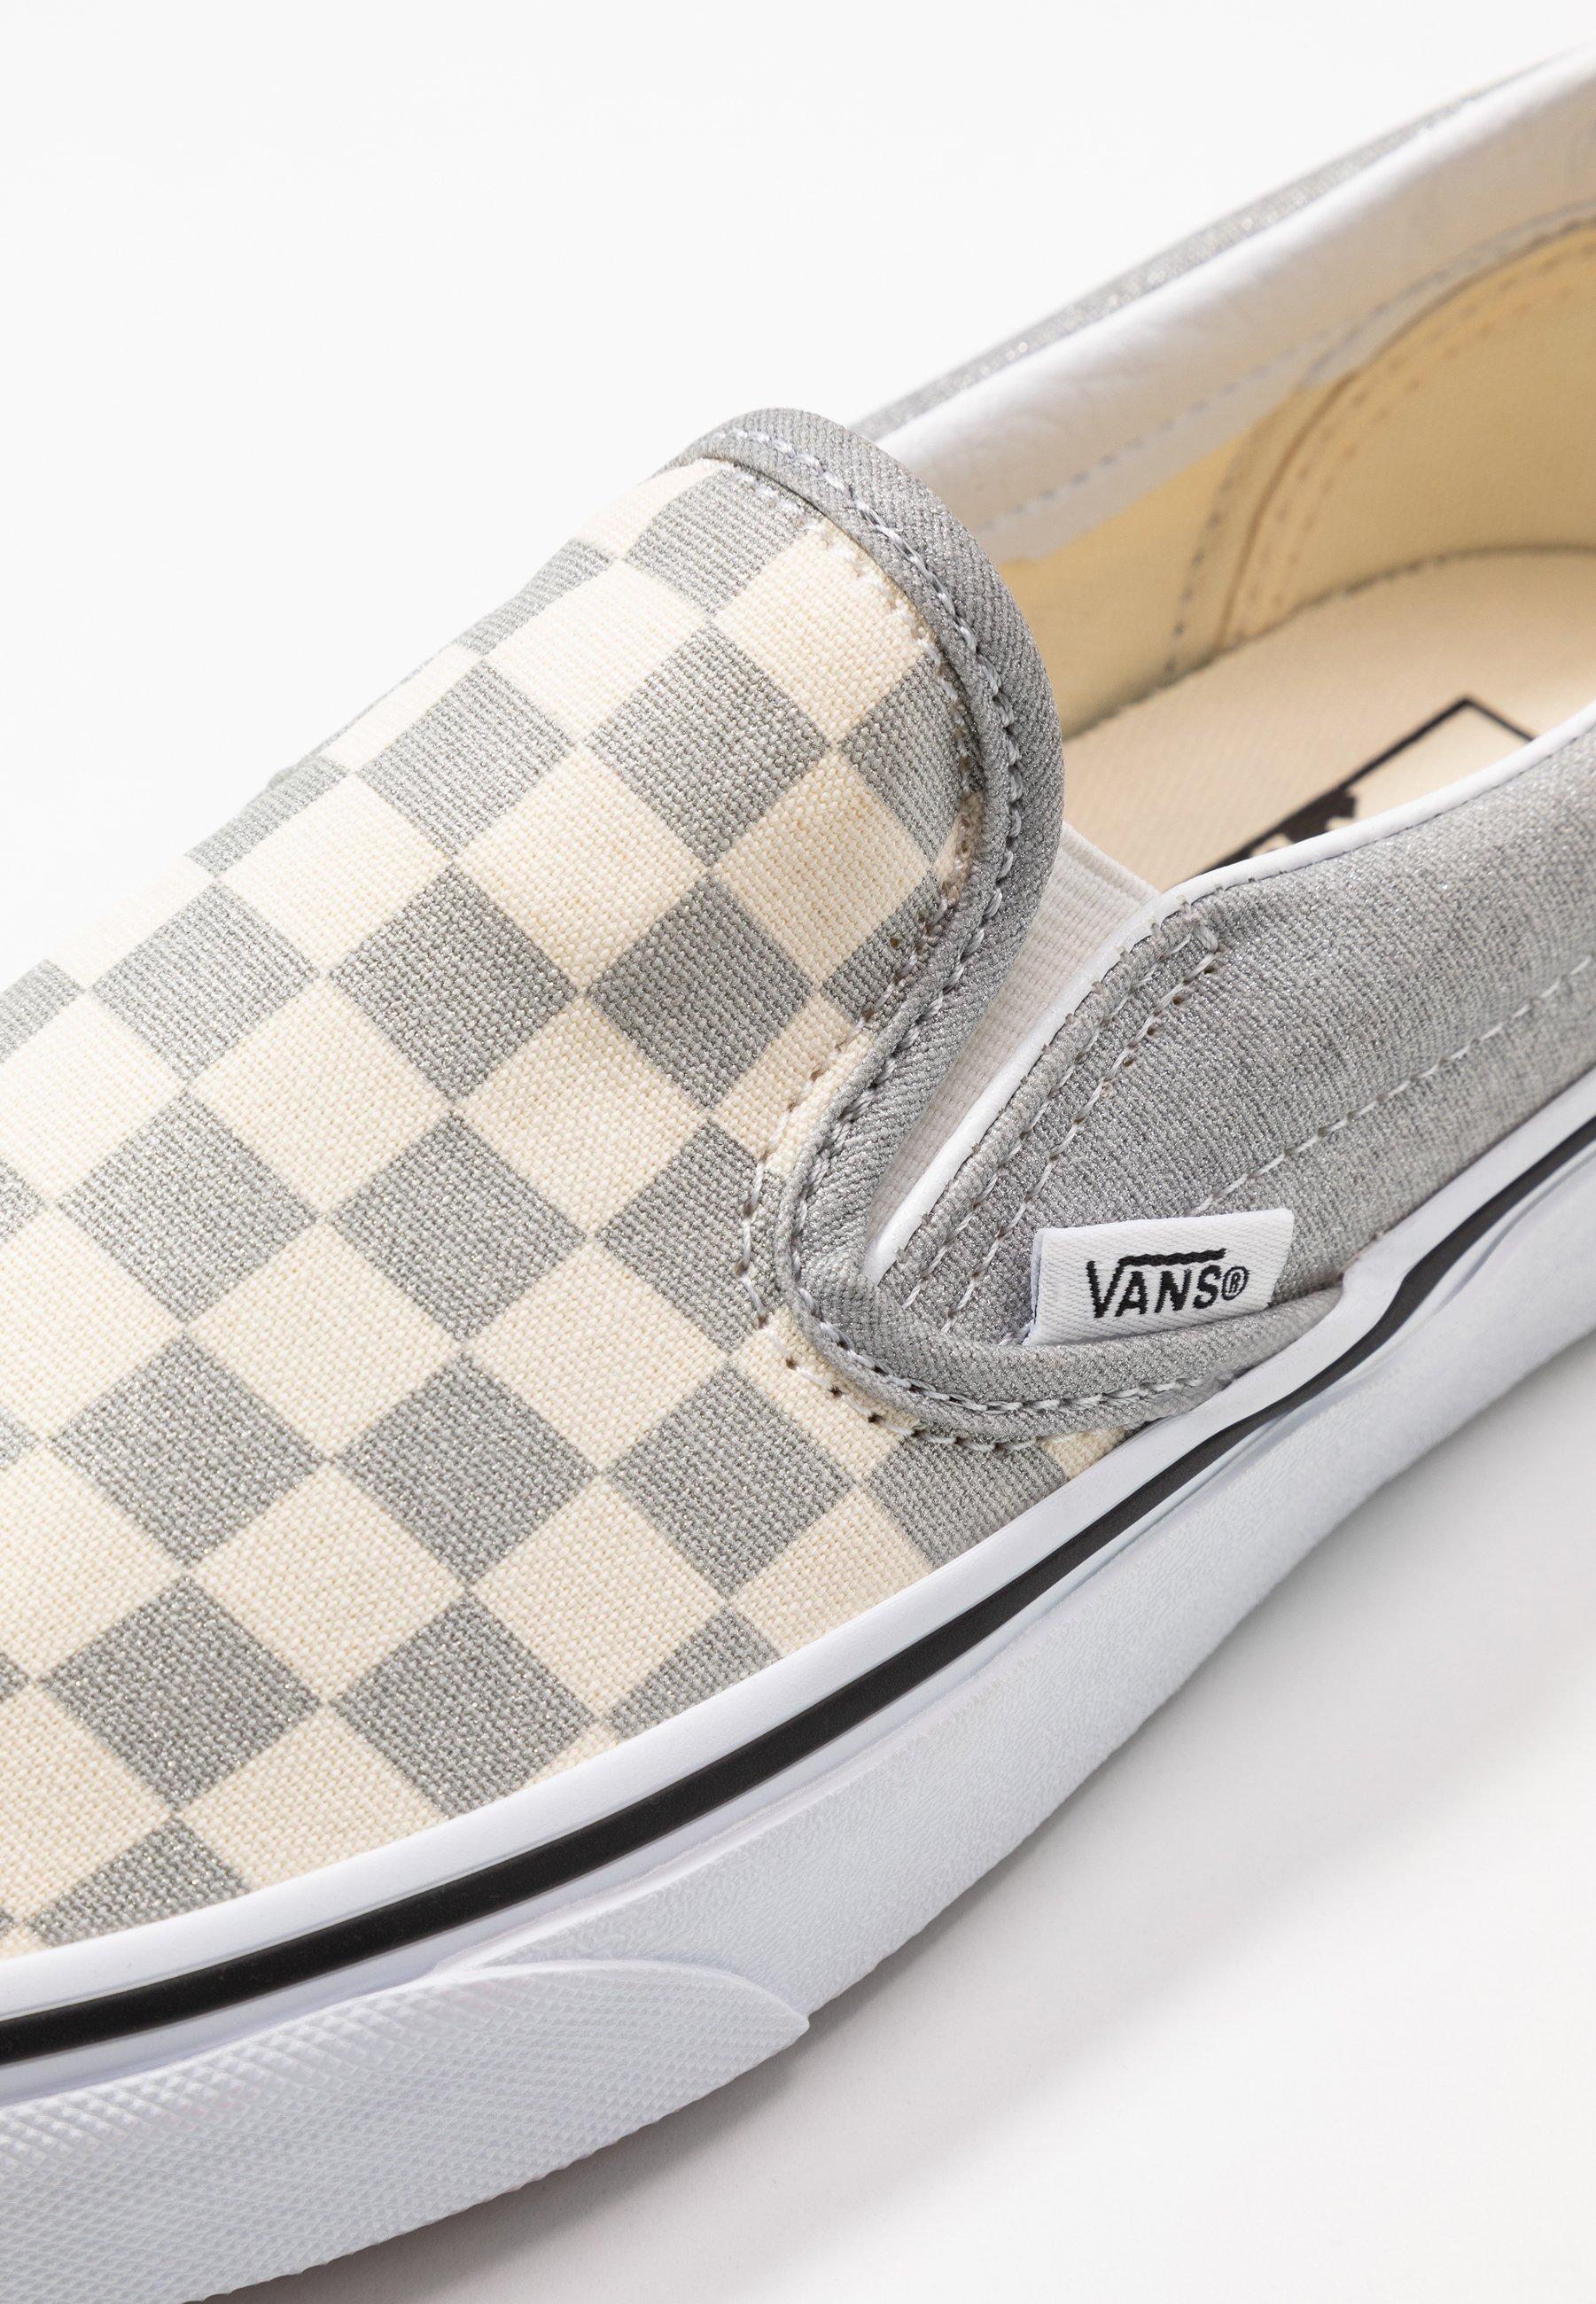 CLASSIC Slipper silvertrue white